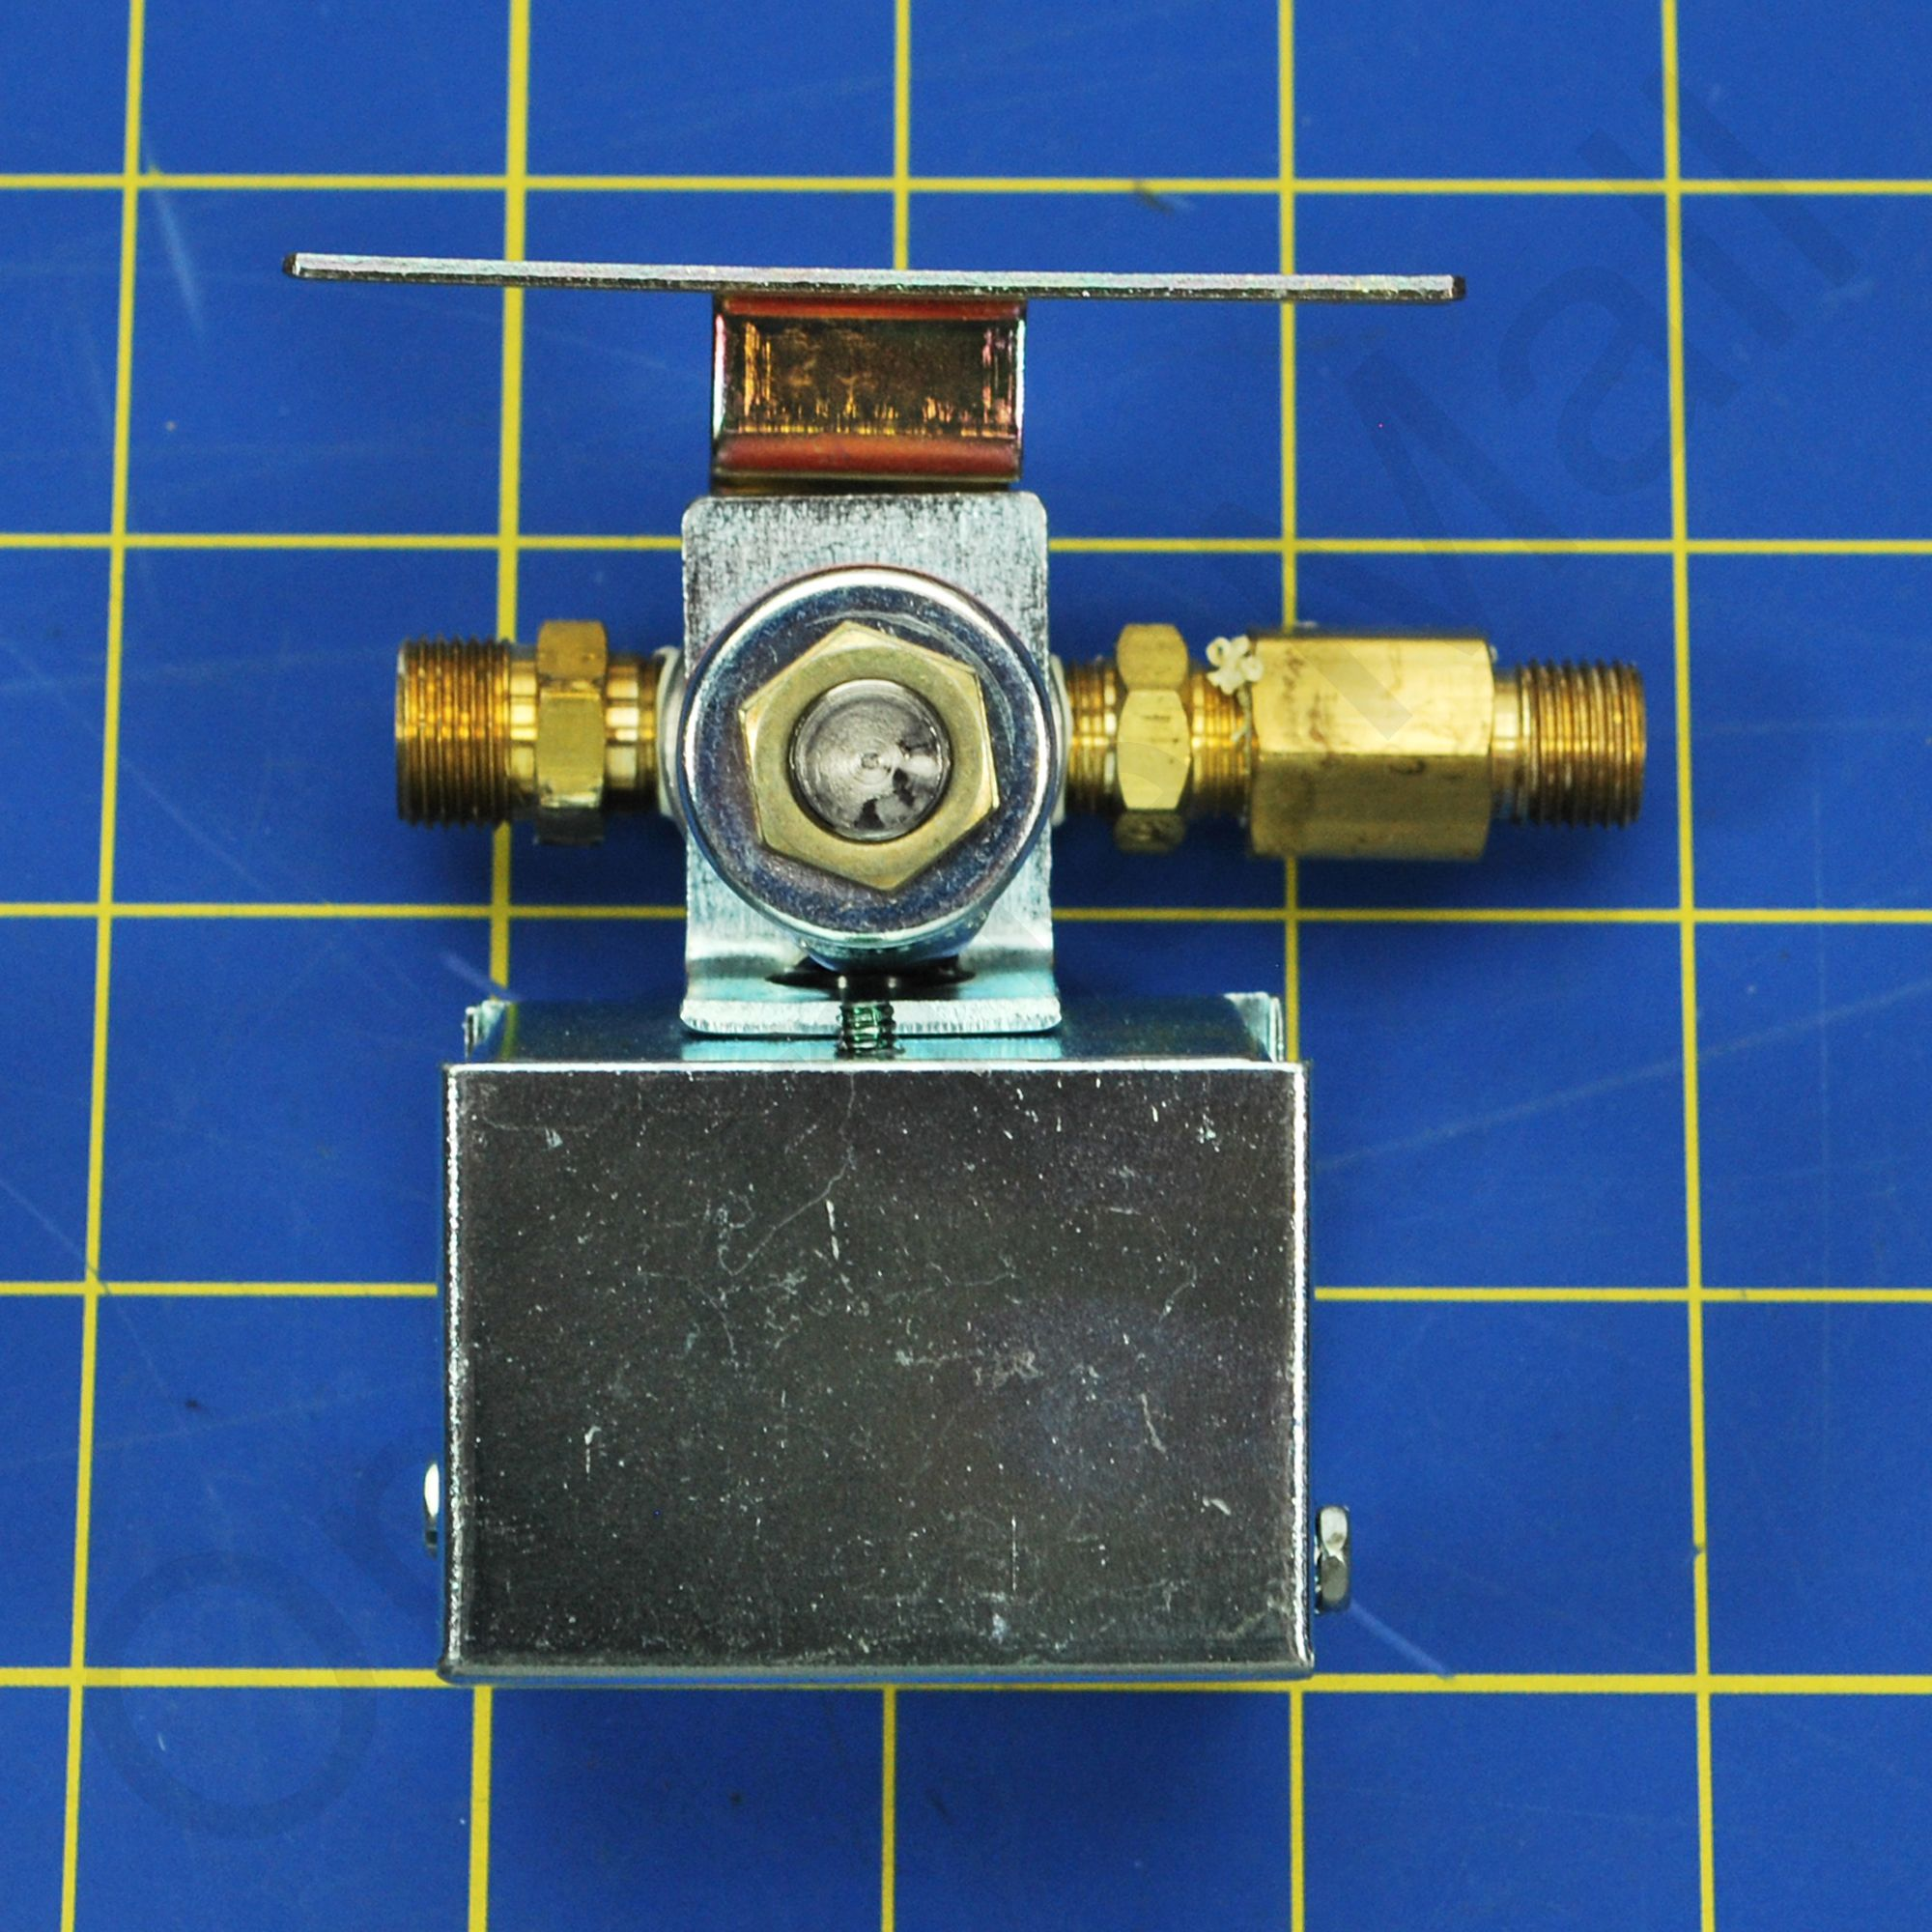 Generalaire 1099-41 Humidifier Solenoid Valve-115V